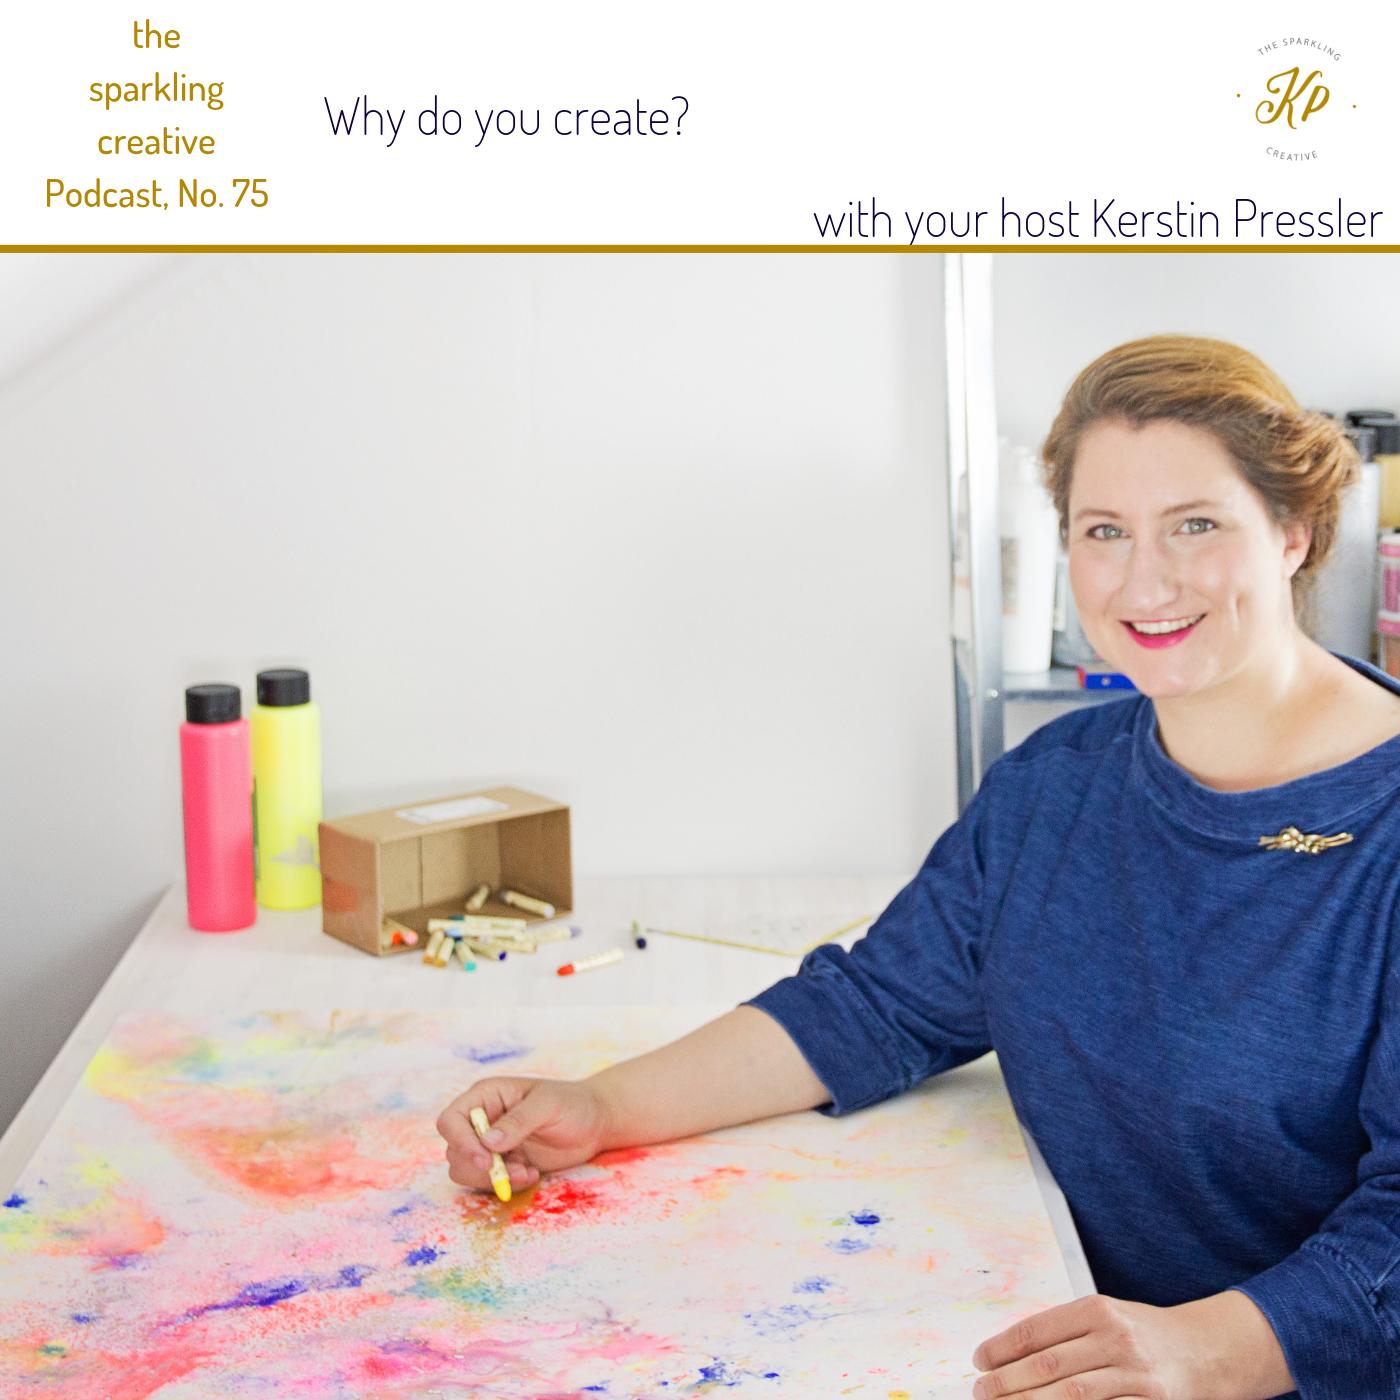 the sparkling creative Podcast, Episode 75: Why do you create?, www.kerstinpressler.com/blog-2/episode75